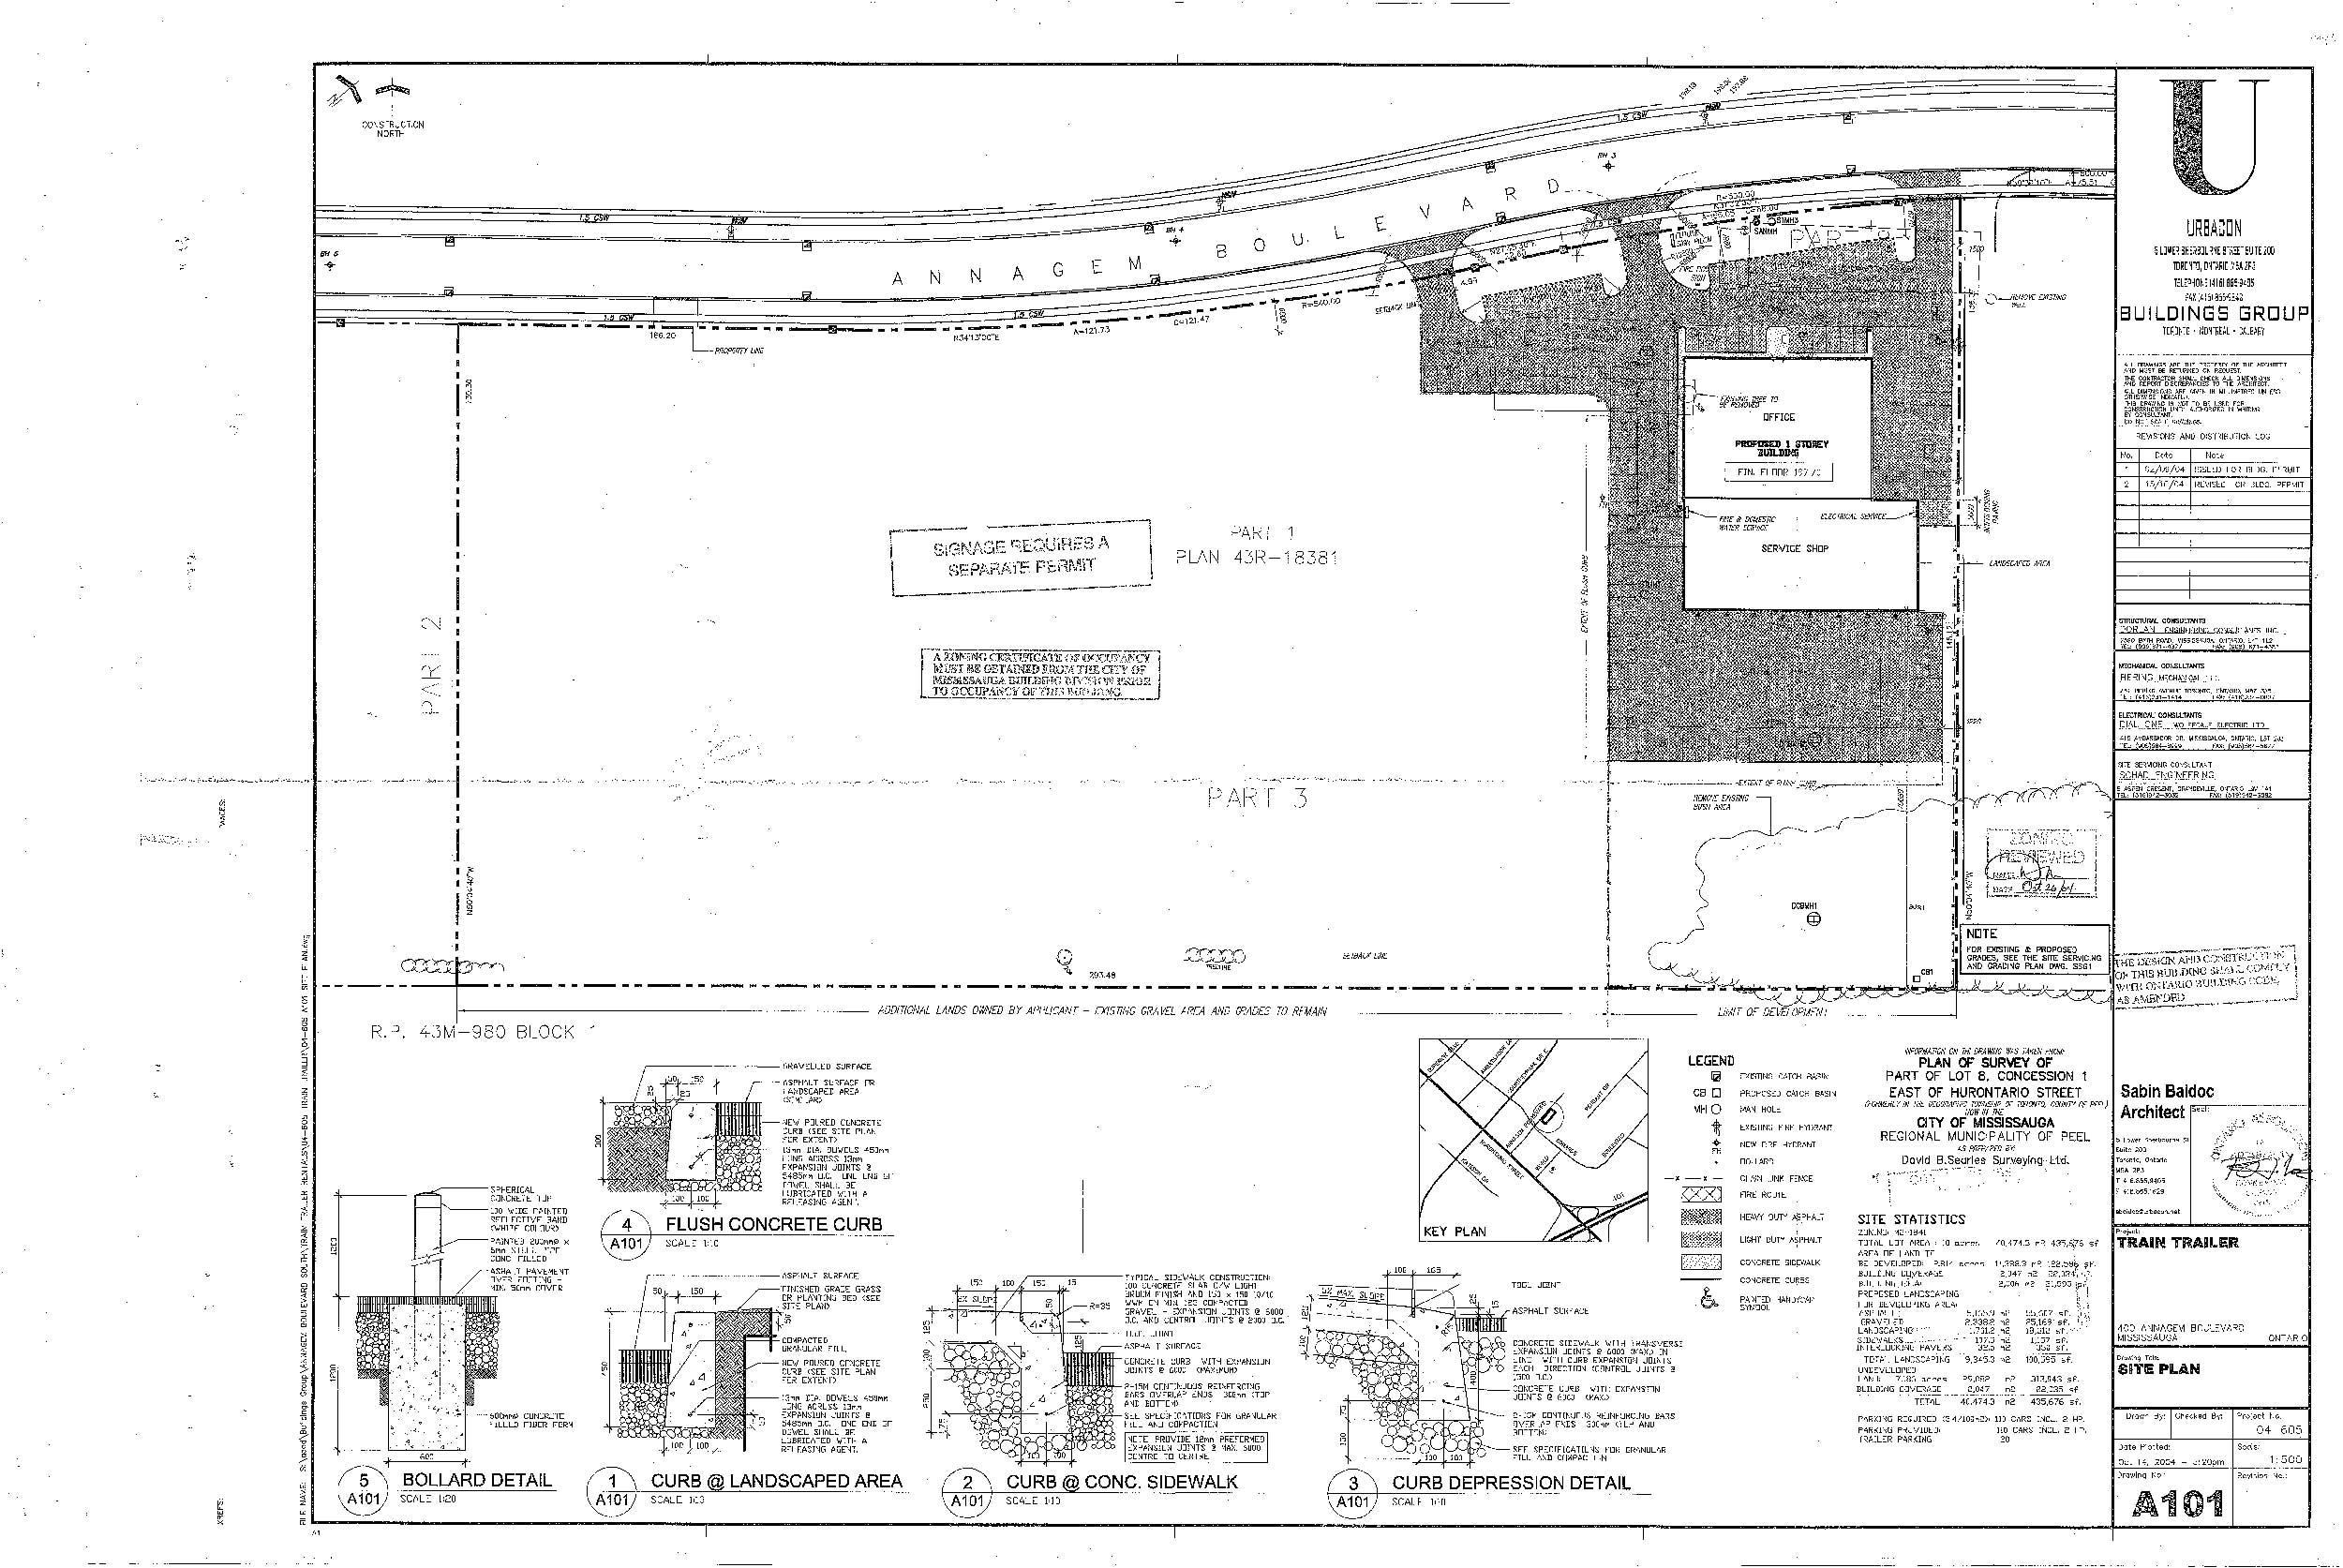 400 Annagem Blvd. Site Plan